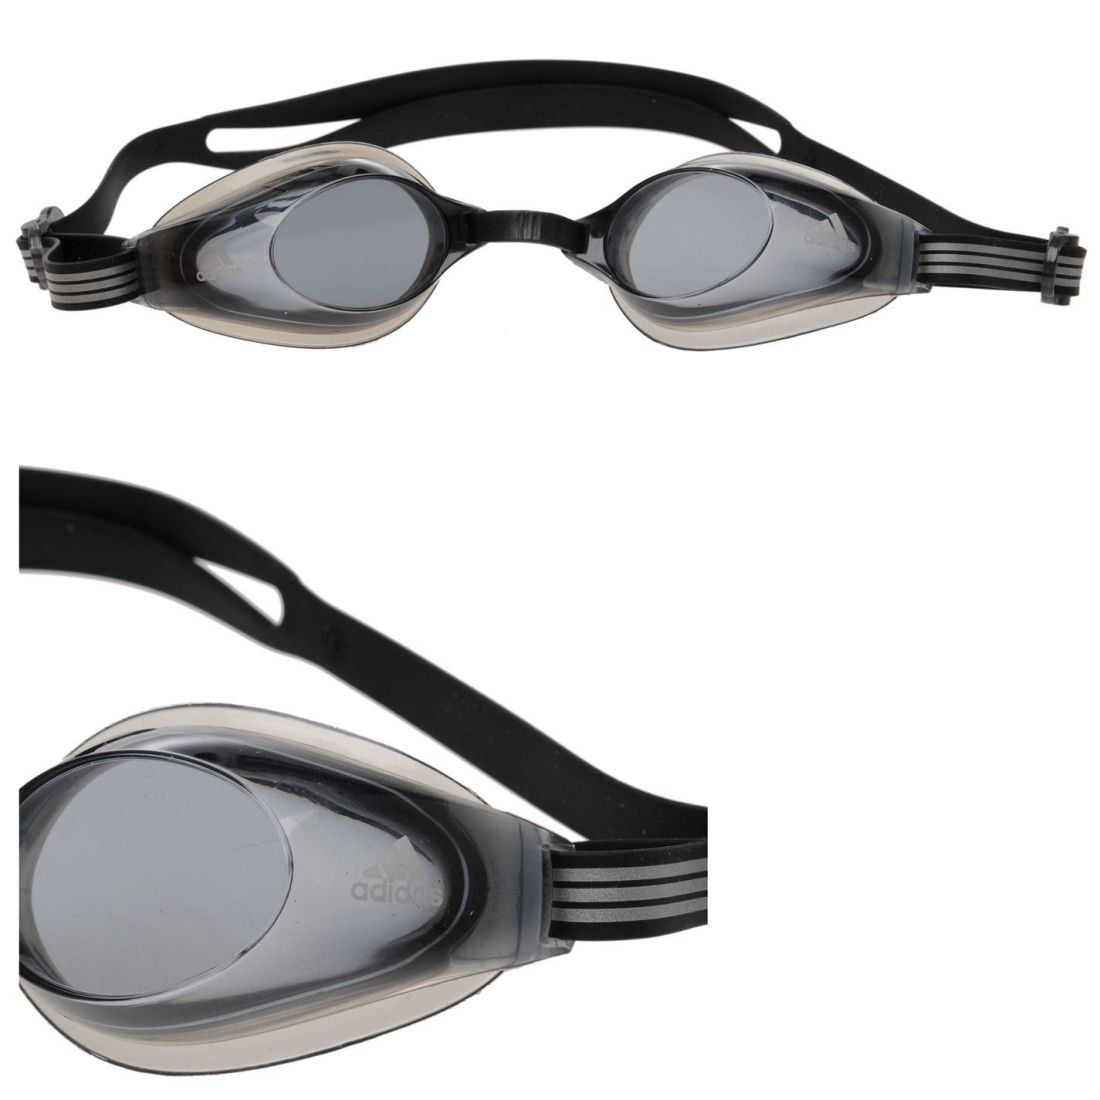 f87cfd713e4e Image is loading Adidas-Unisex-Aquastorm-Swimming-Goggle -Head-Strap-Training-